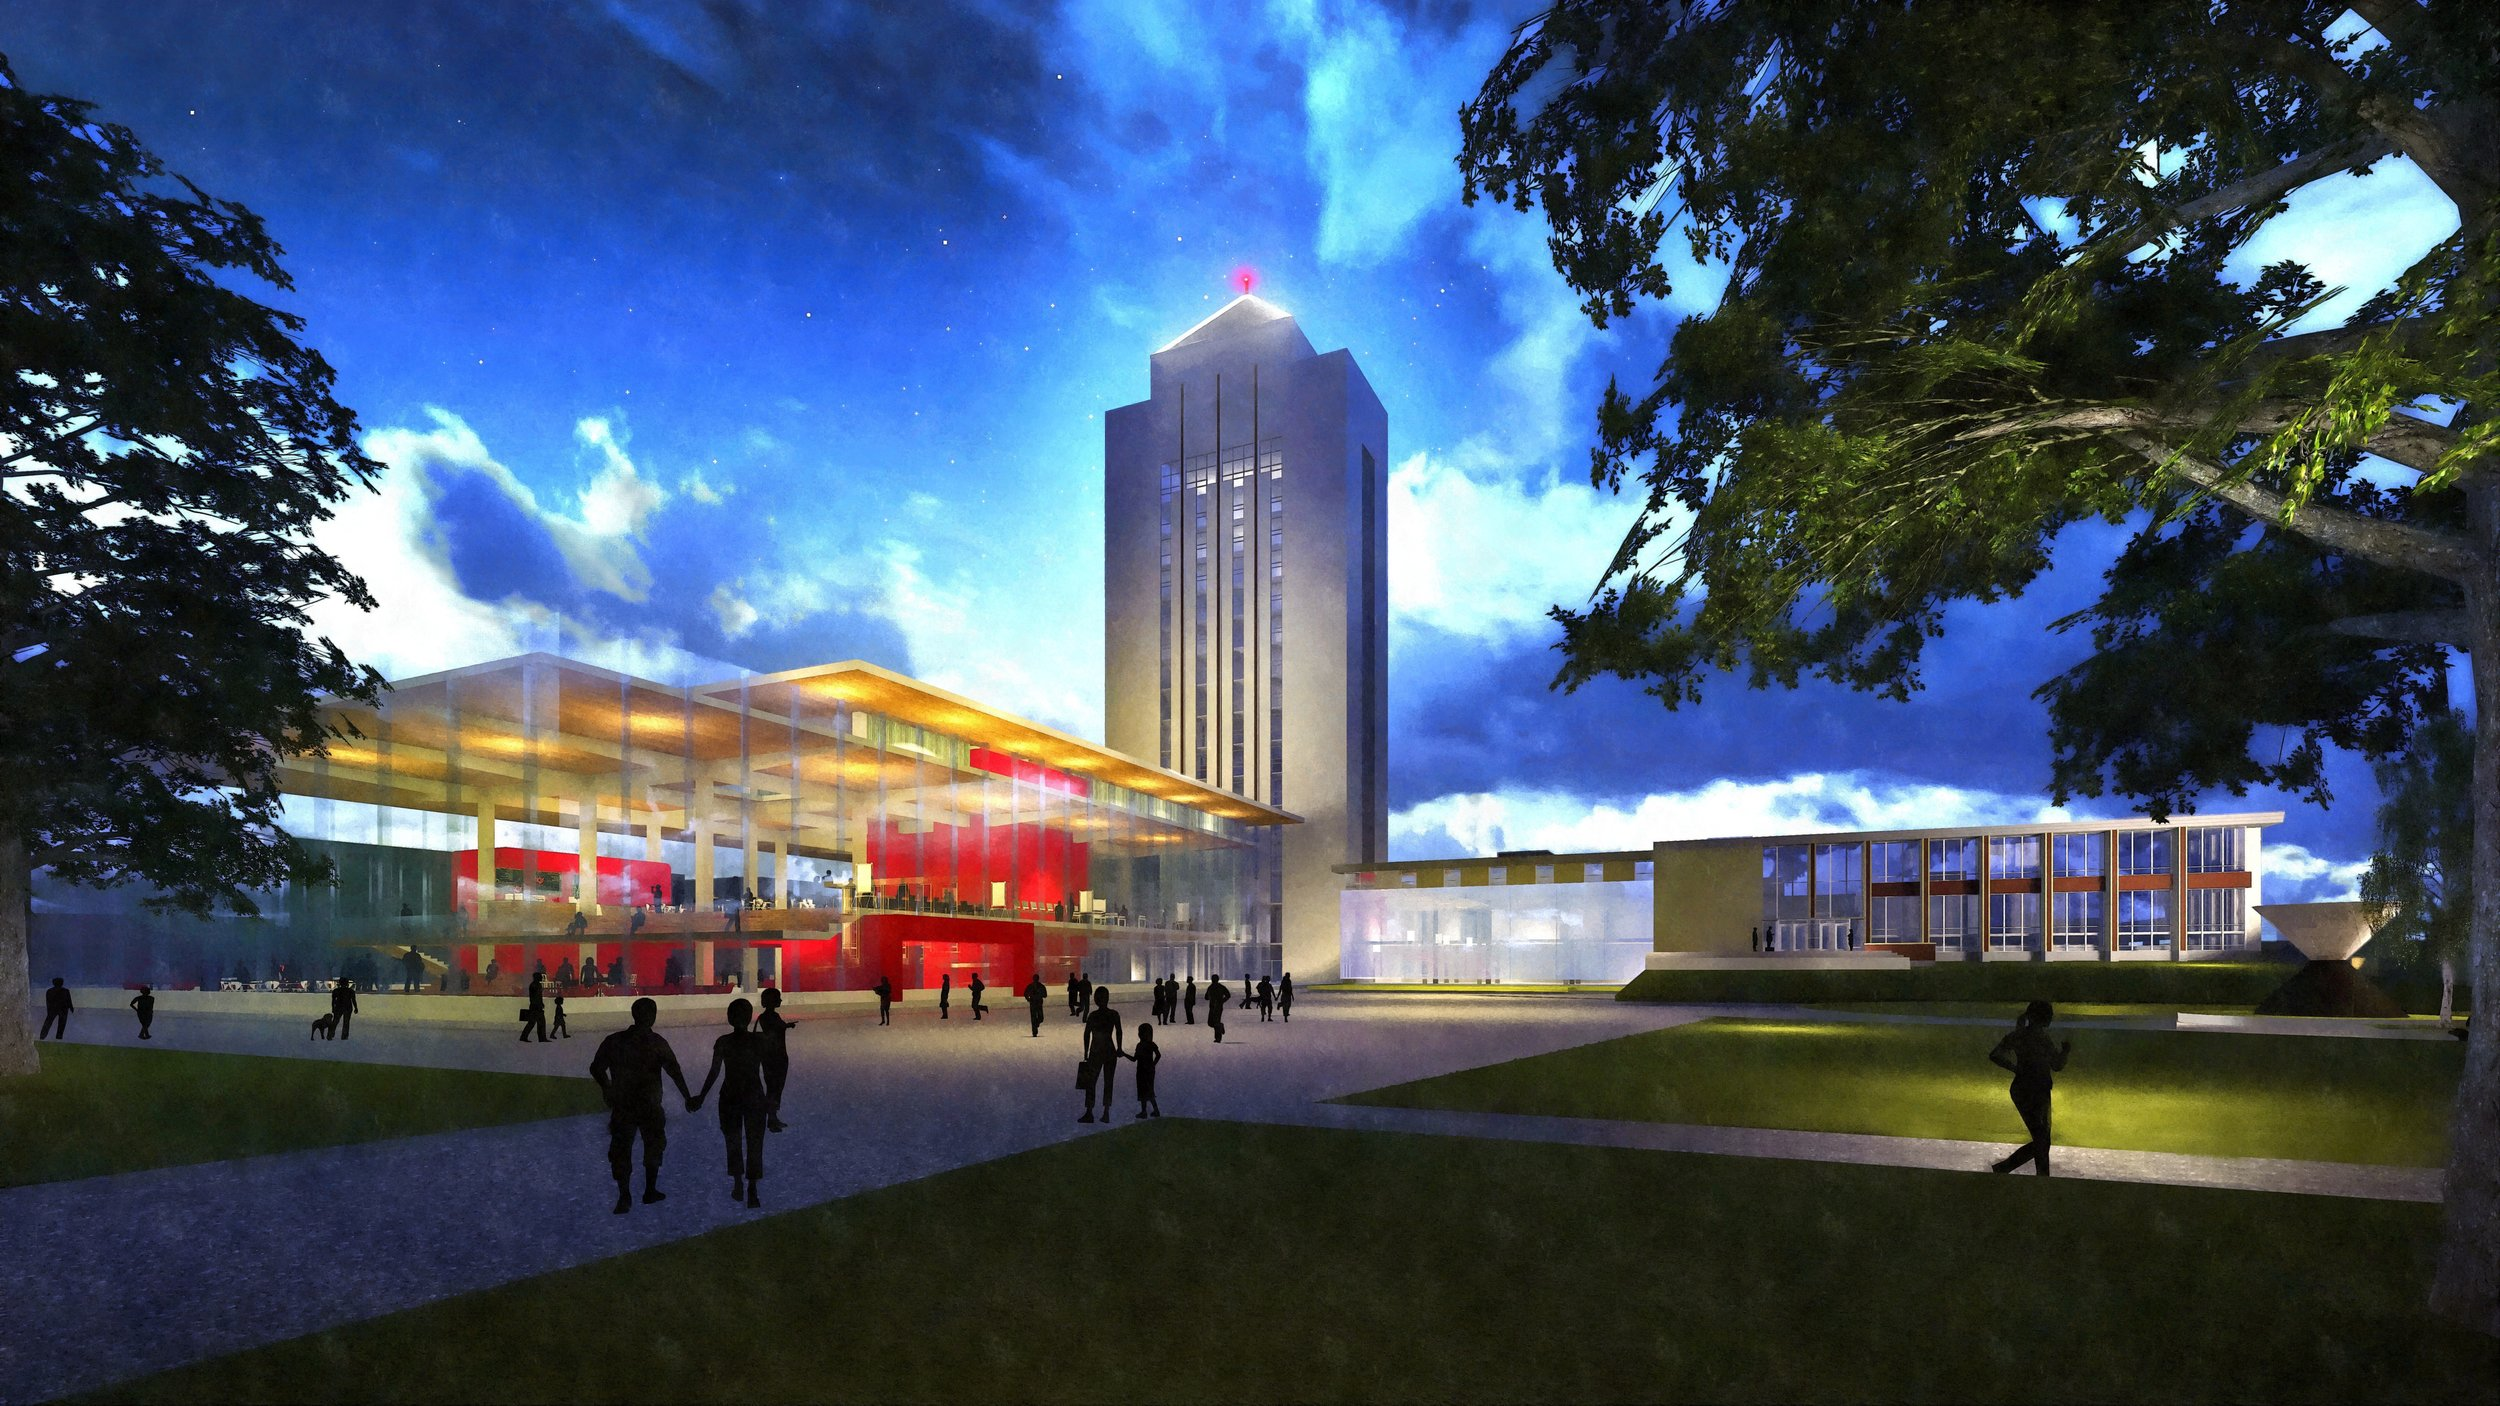 Northern Illinois University Holmes Student Center Master Plan